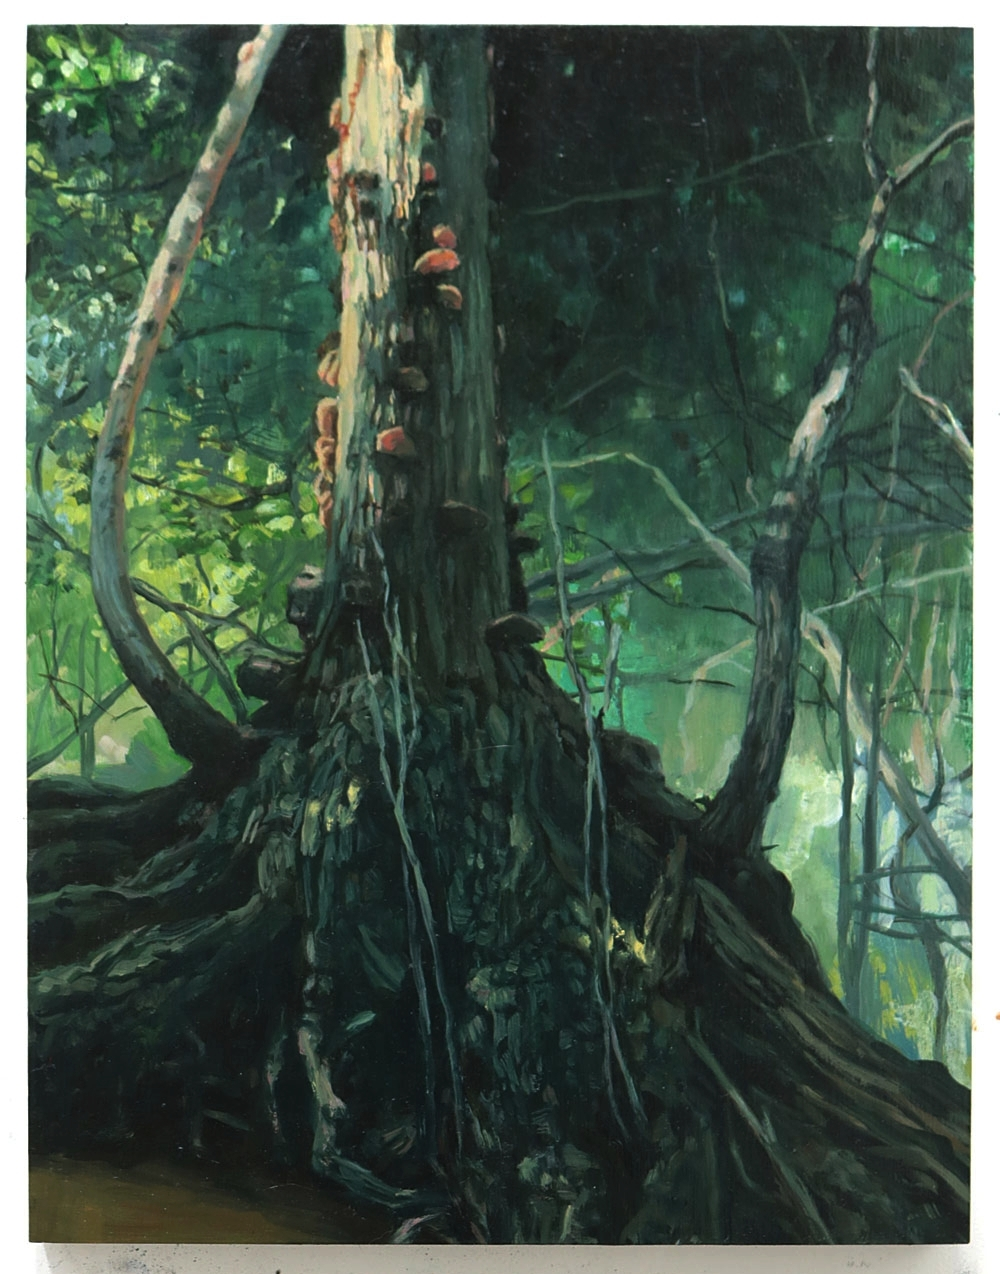 Tree with Fungus